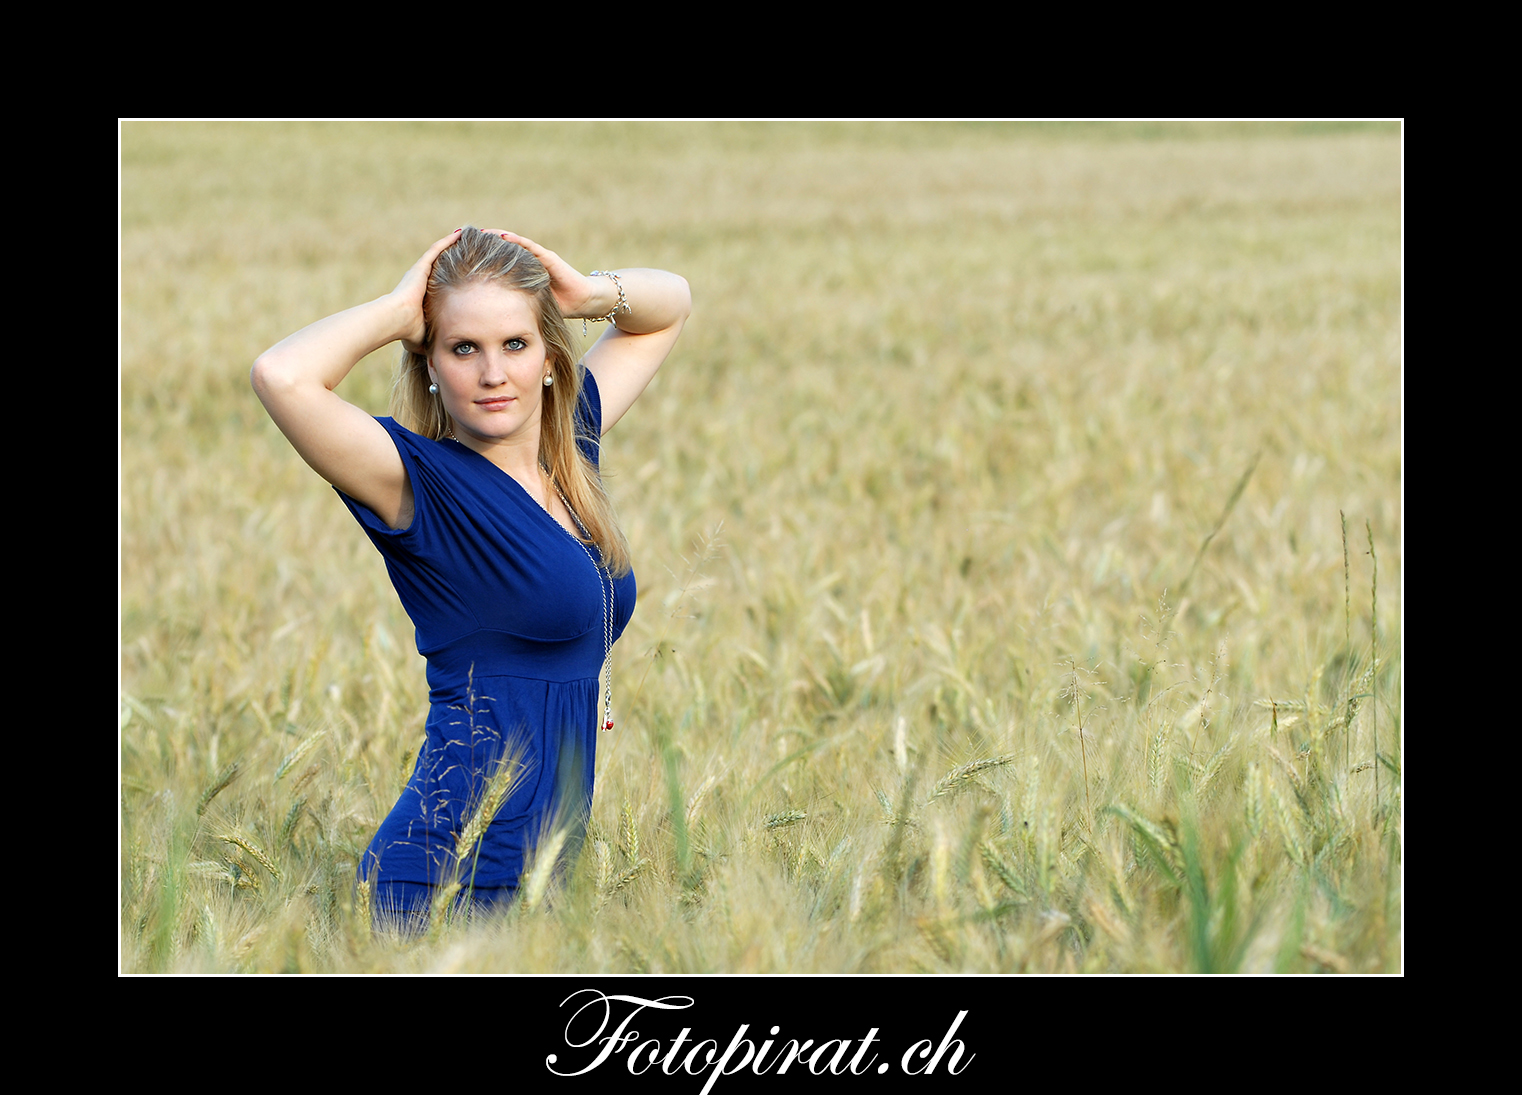 Fotoshooting, outdoor, Modelagentur, sexy Model, Fitnessmodel, blondes Fotomodel